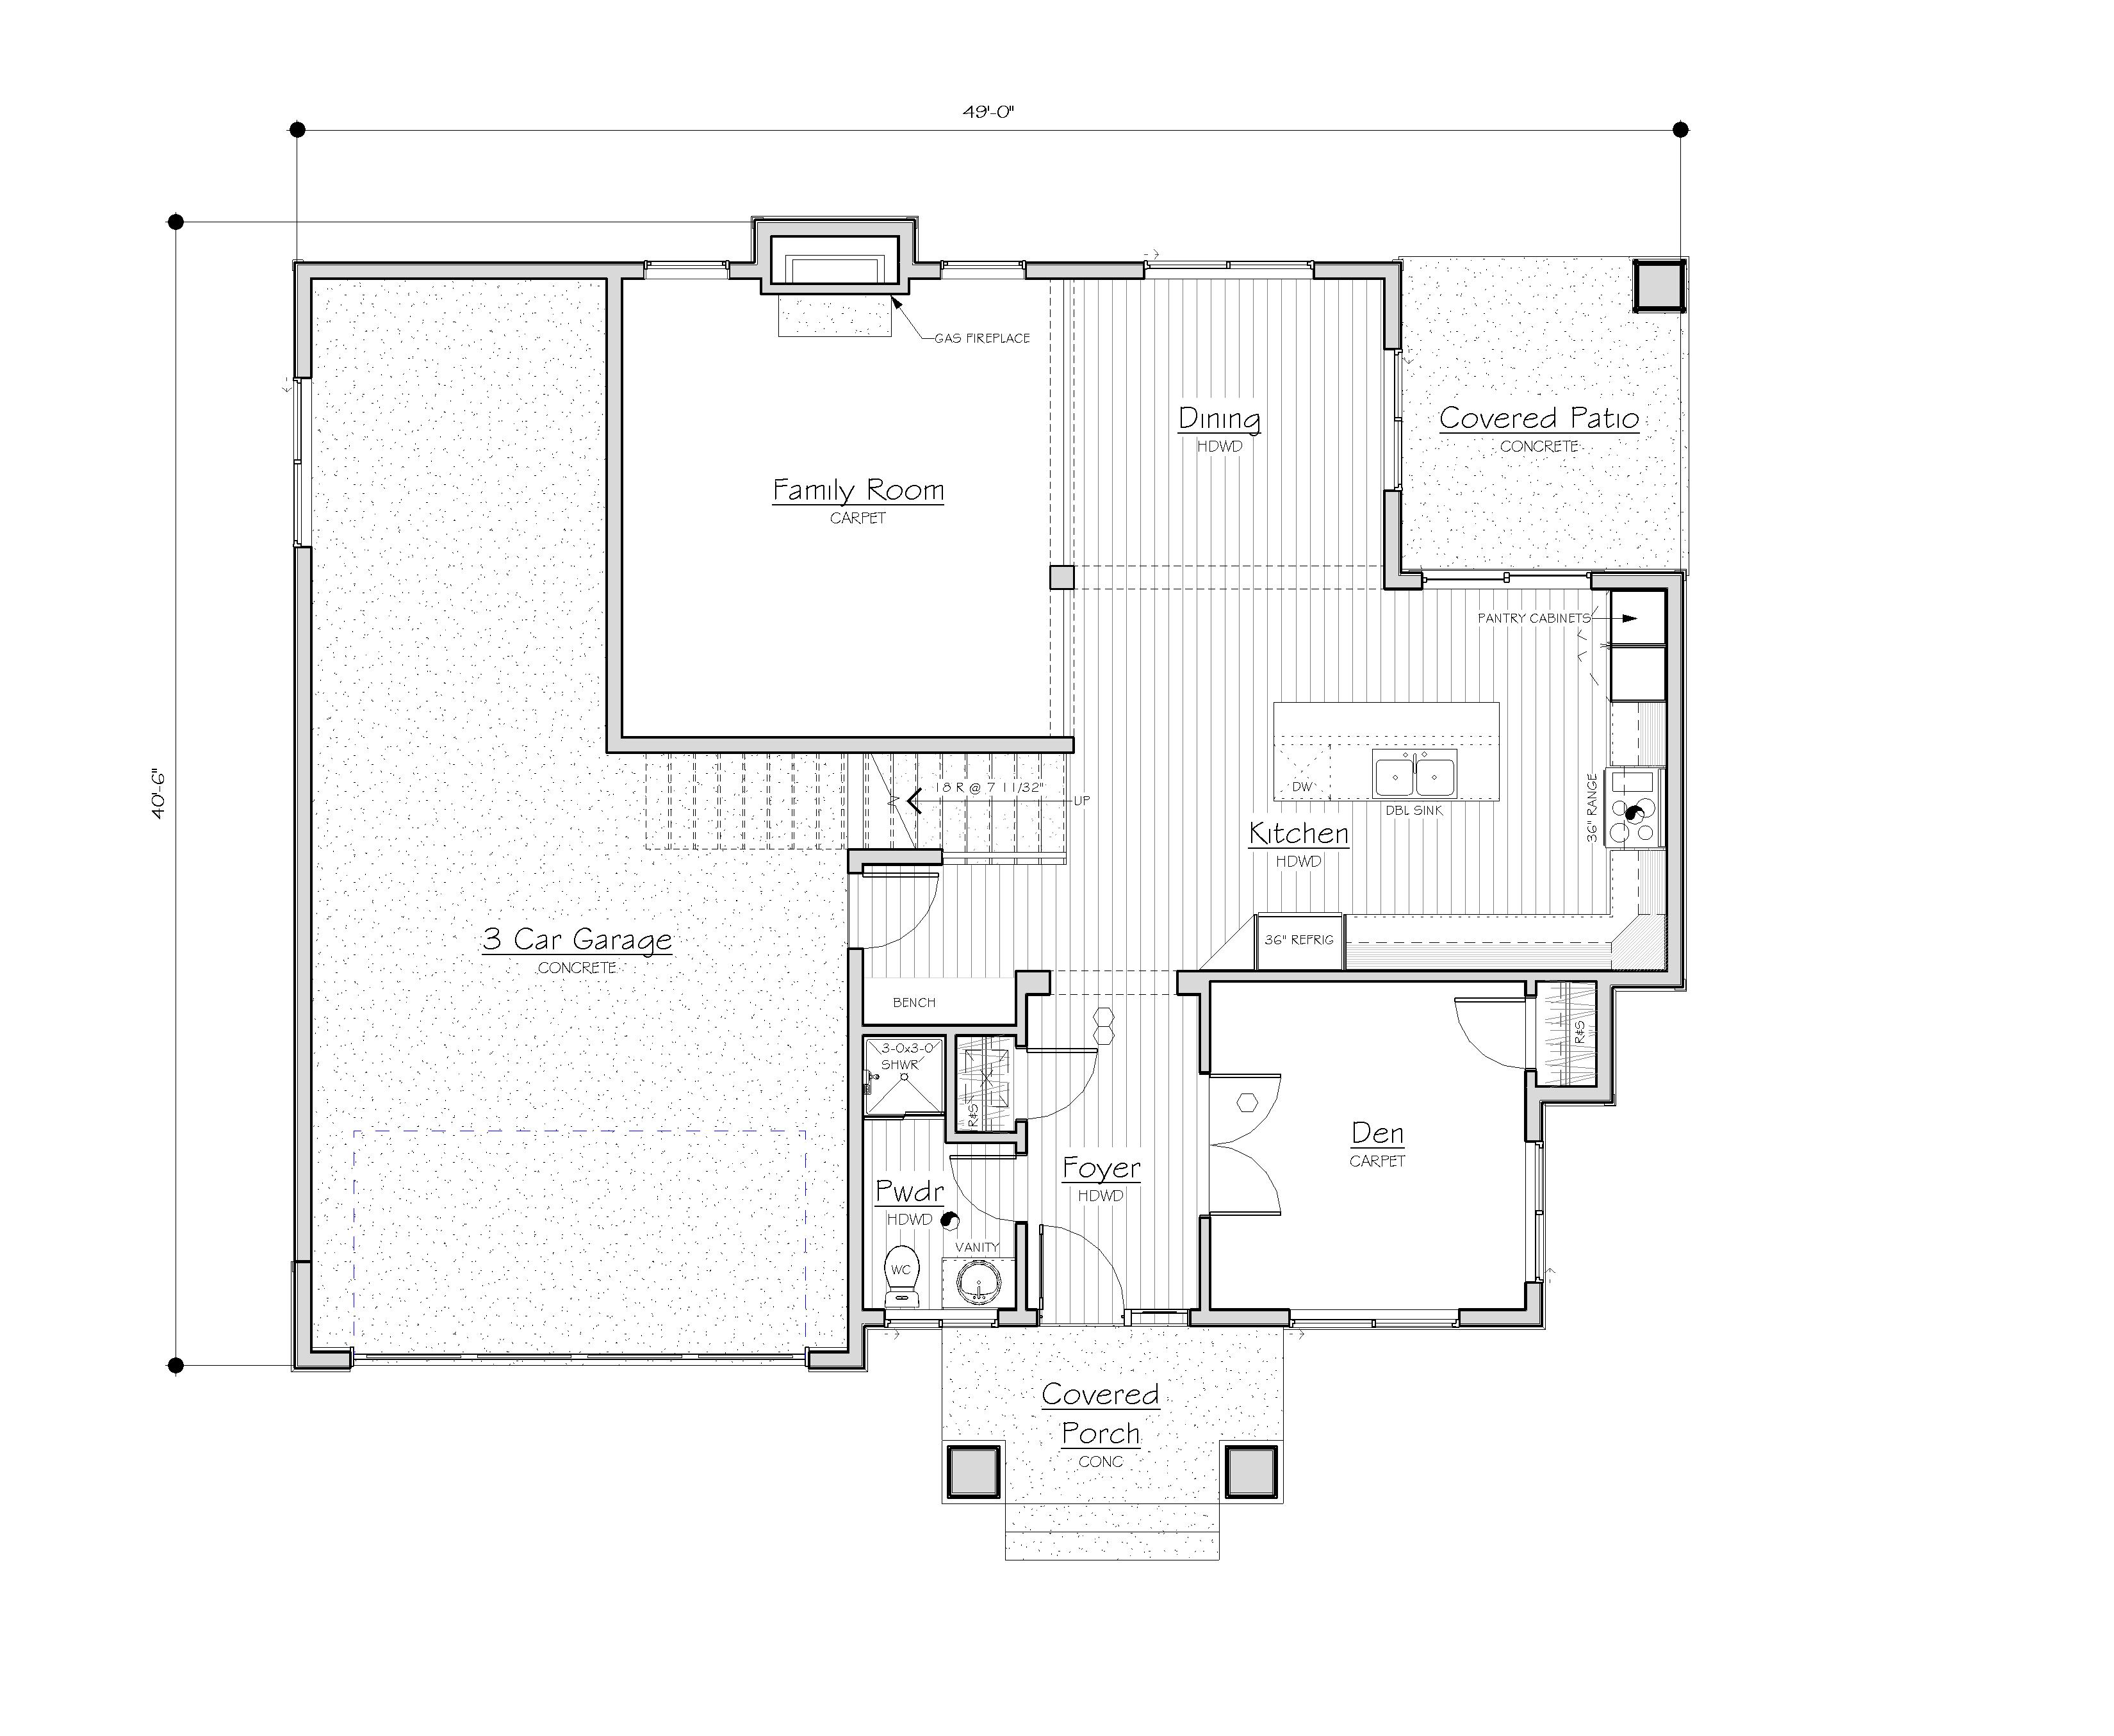 3521 ne 7th st lot 5 custom homes seattle bellevue for Copying house plans